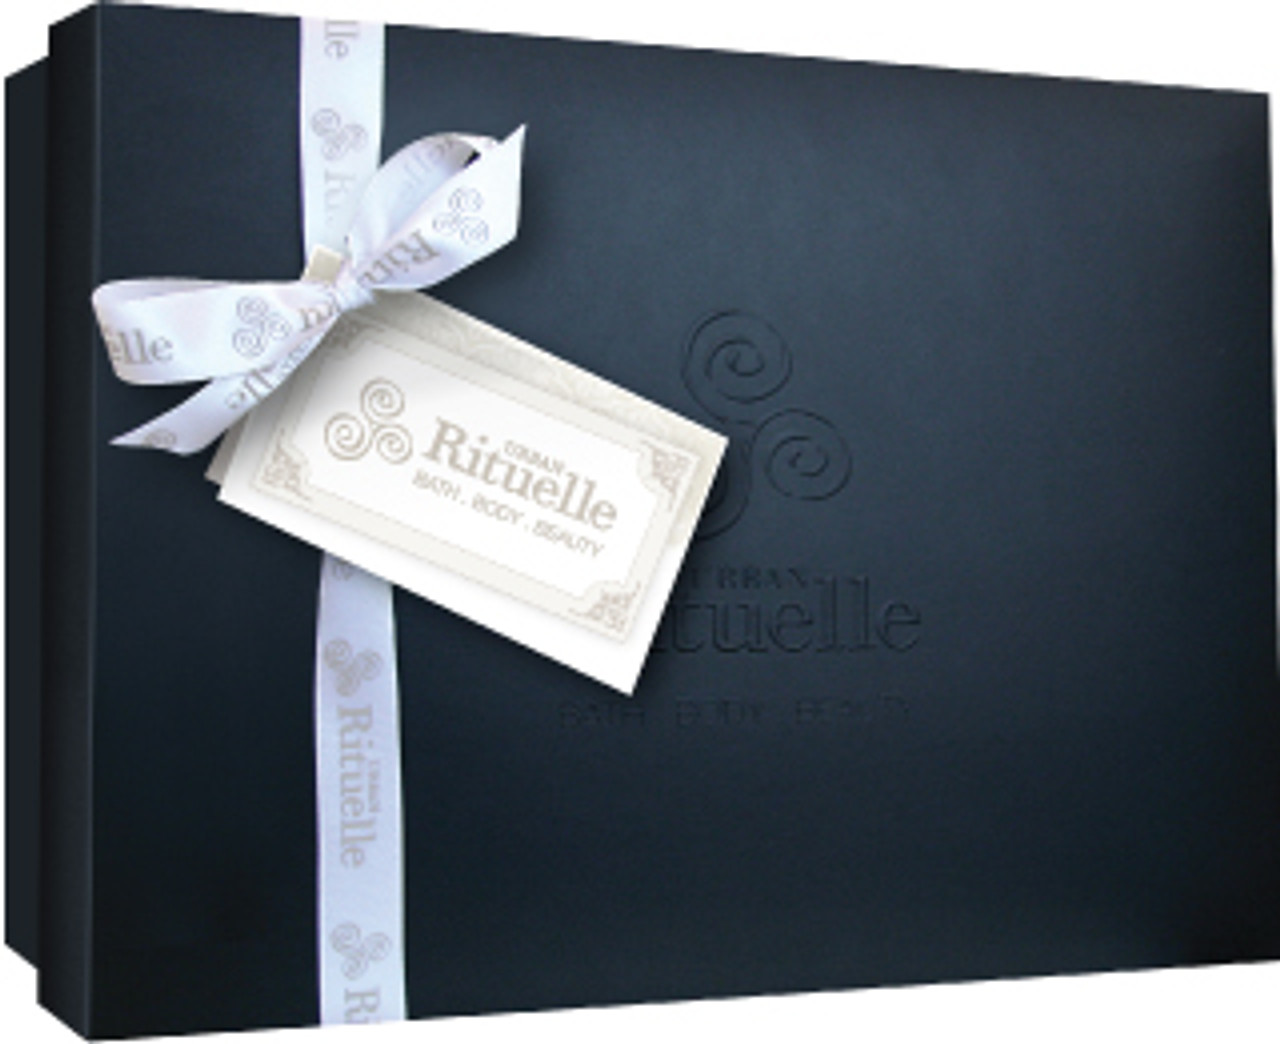 Gift Box Black Gift Box Black - Extra Large - Urban Rituelle